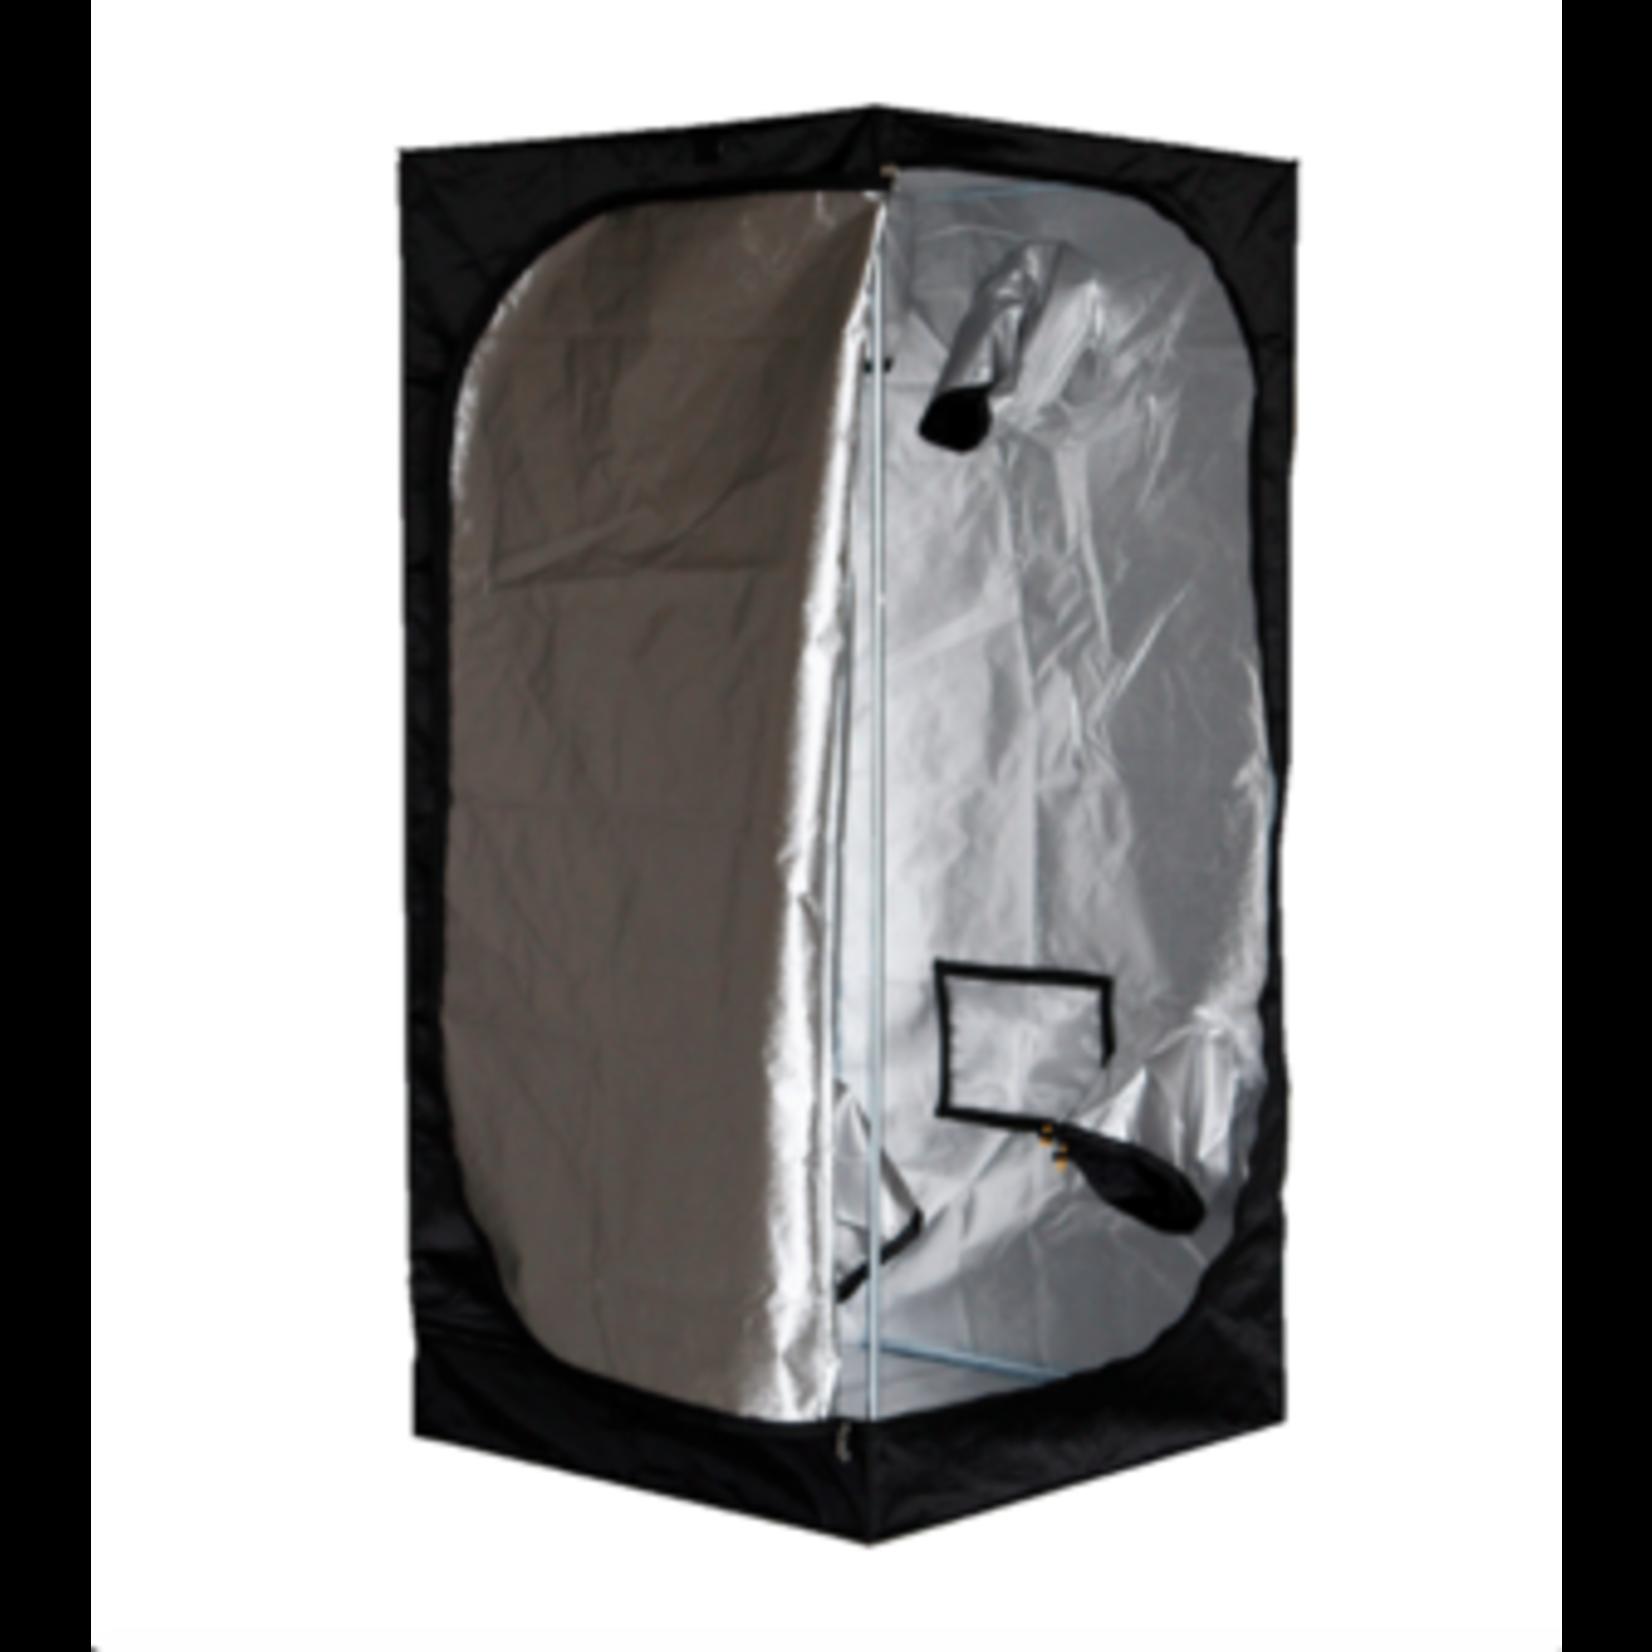 MY BRAND HYDRO HOME (THICK) - TOKYO Tent  2.3' X 4.3' X 7'